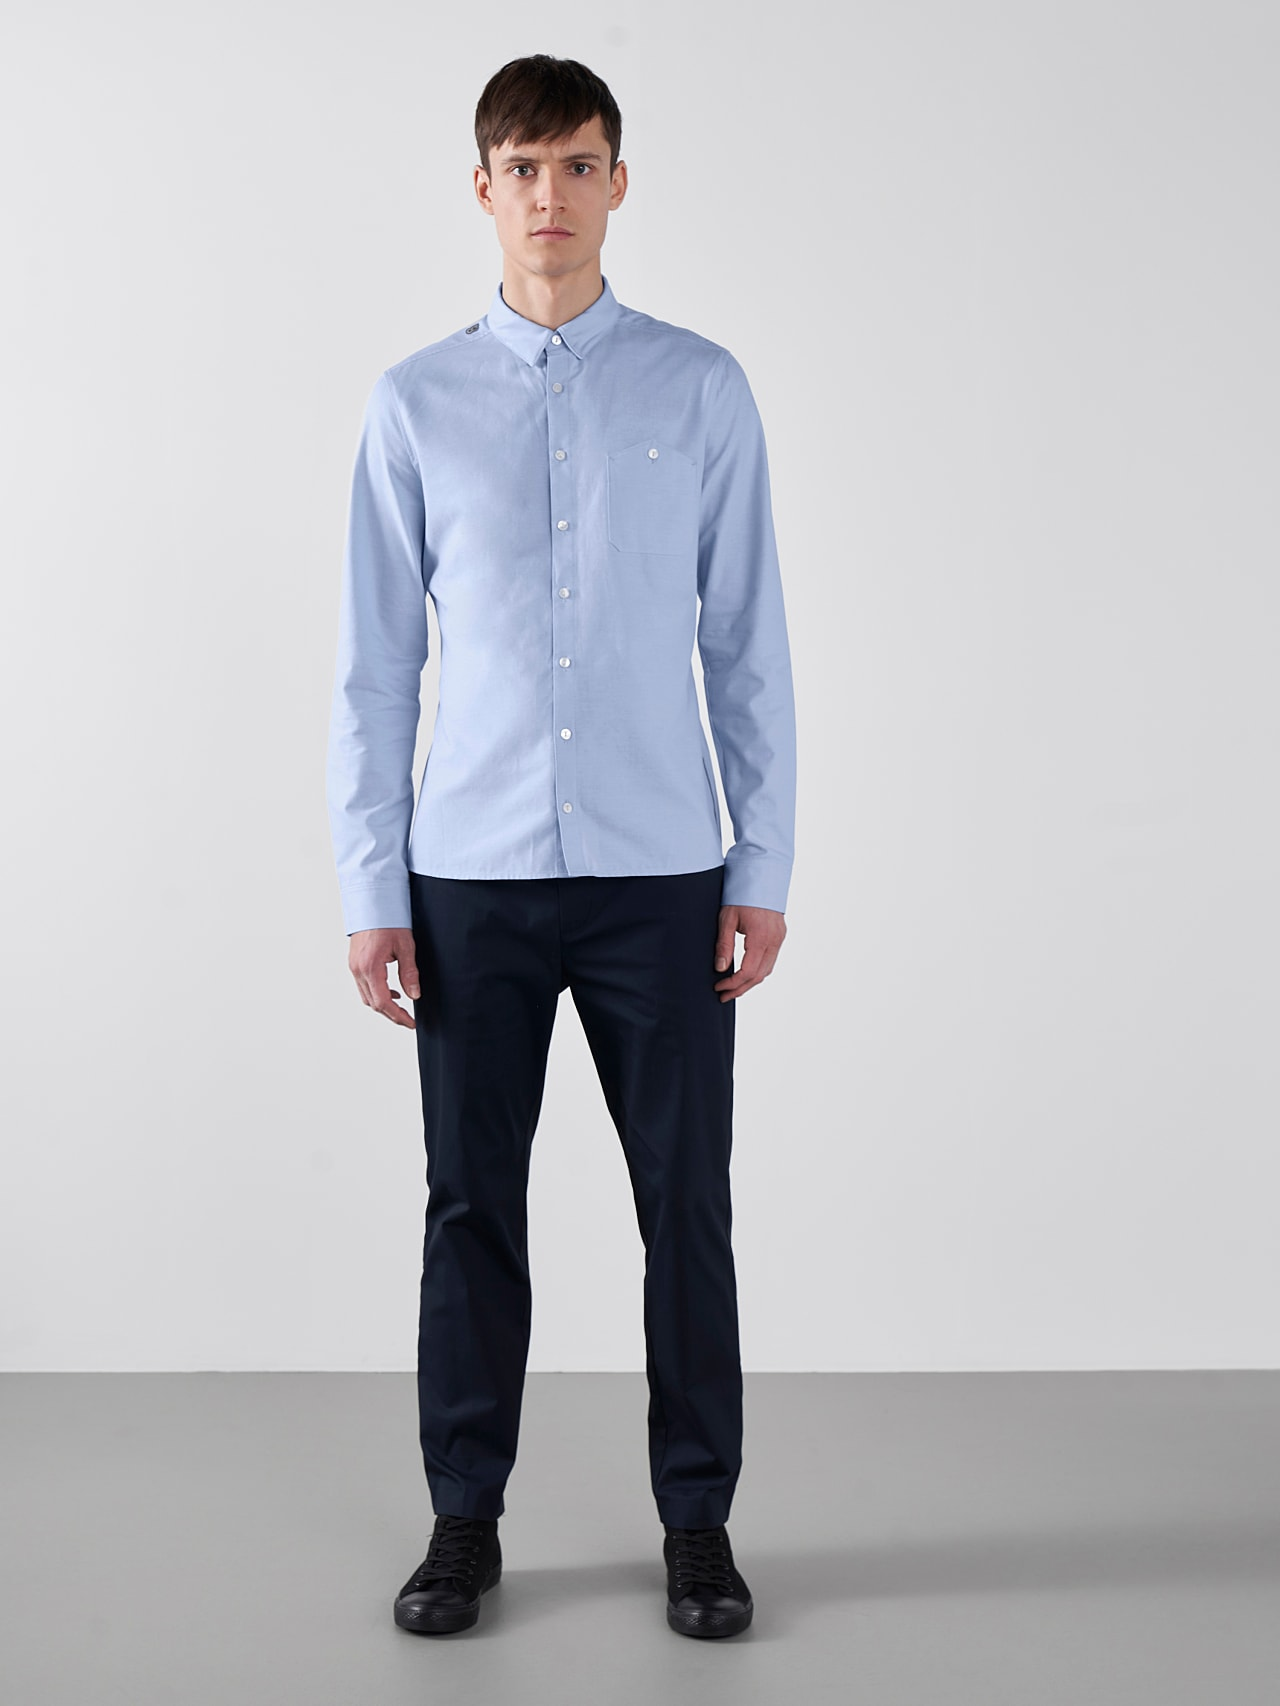 WOSKA V2.Y5.01 Kent Collar Oxford Shirt light blue Front Alpha Tauri